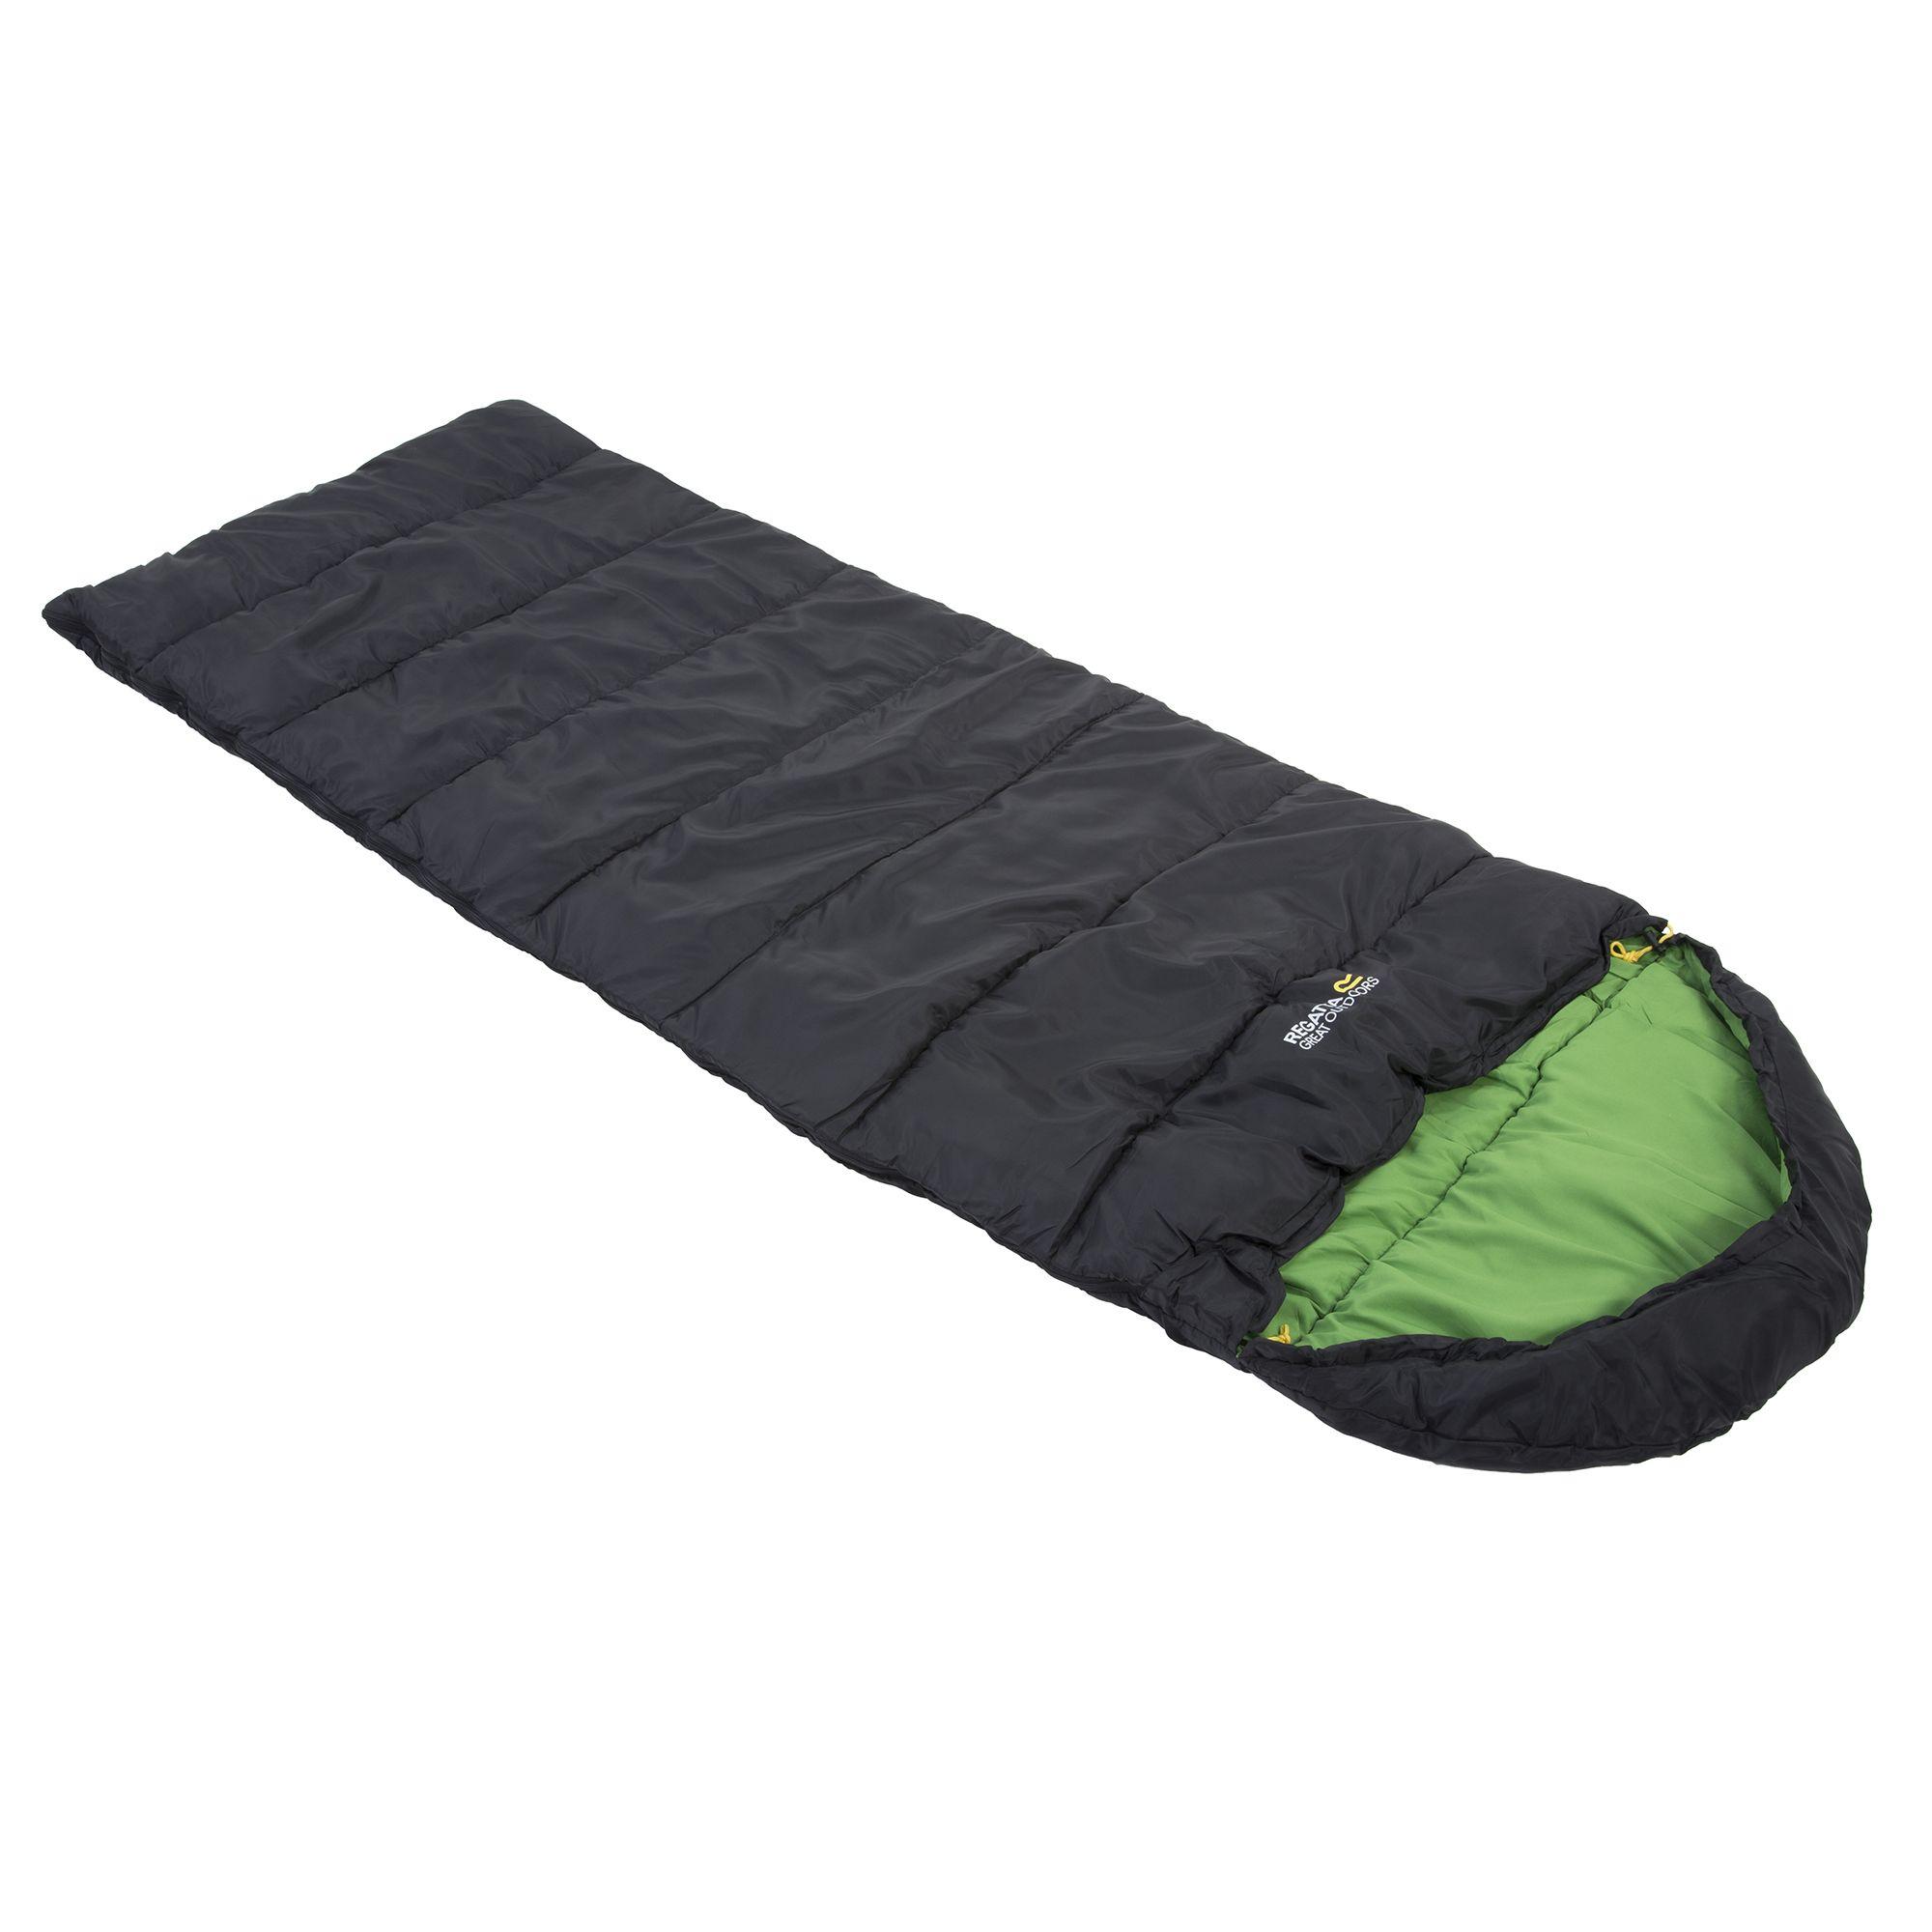 Hana 200 Polyester Lined Mummy Sleeping Bag Black